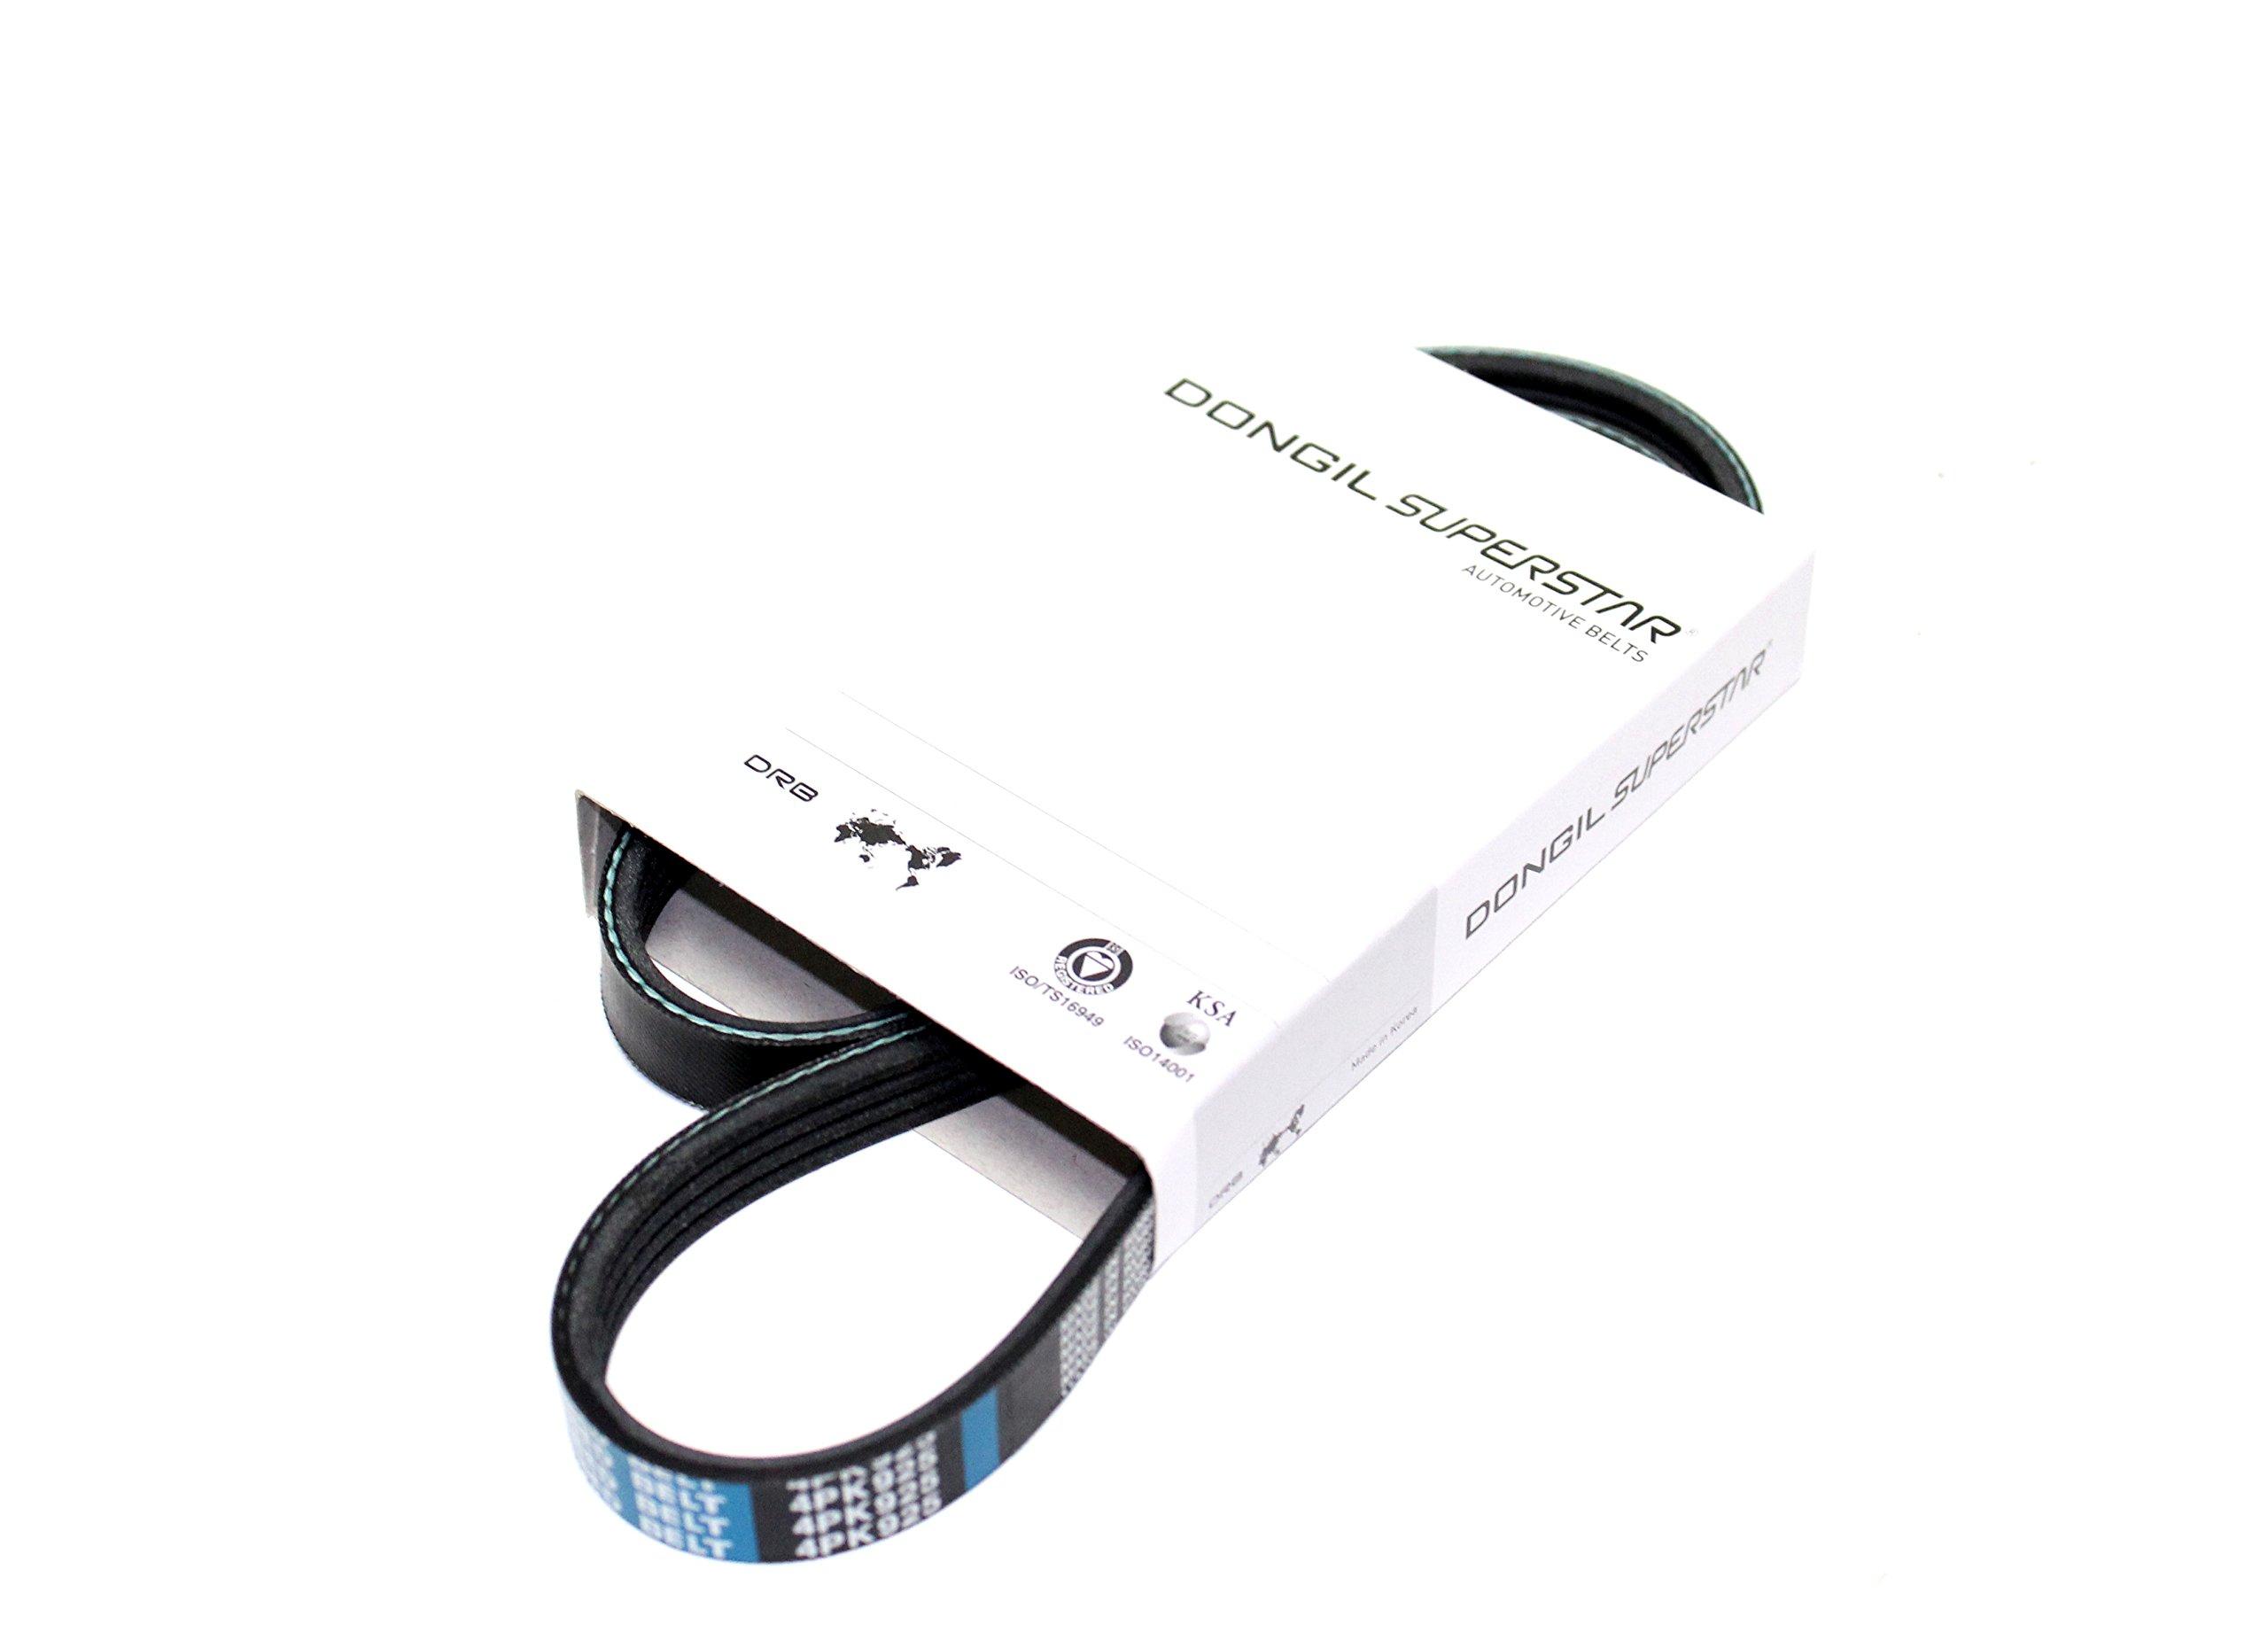 Compresor Belt for TRAIL BLAZER / GRAND VITARA / SPORTAGE Part: 57170-37310 5717037310 4PK925